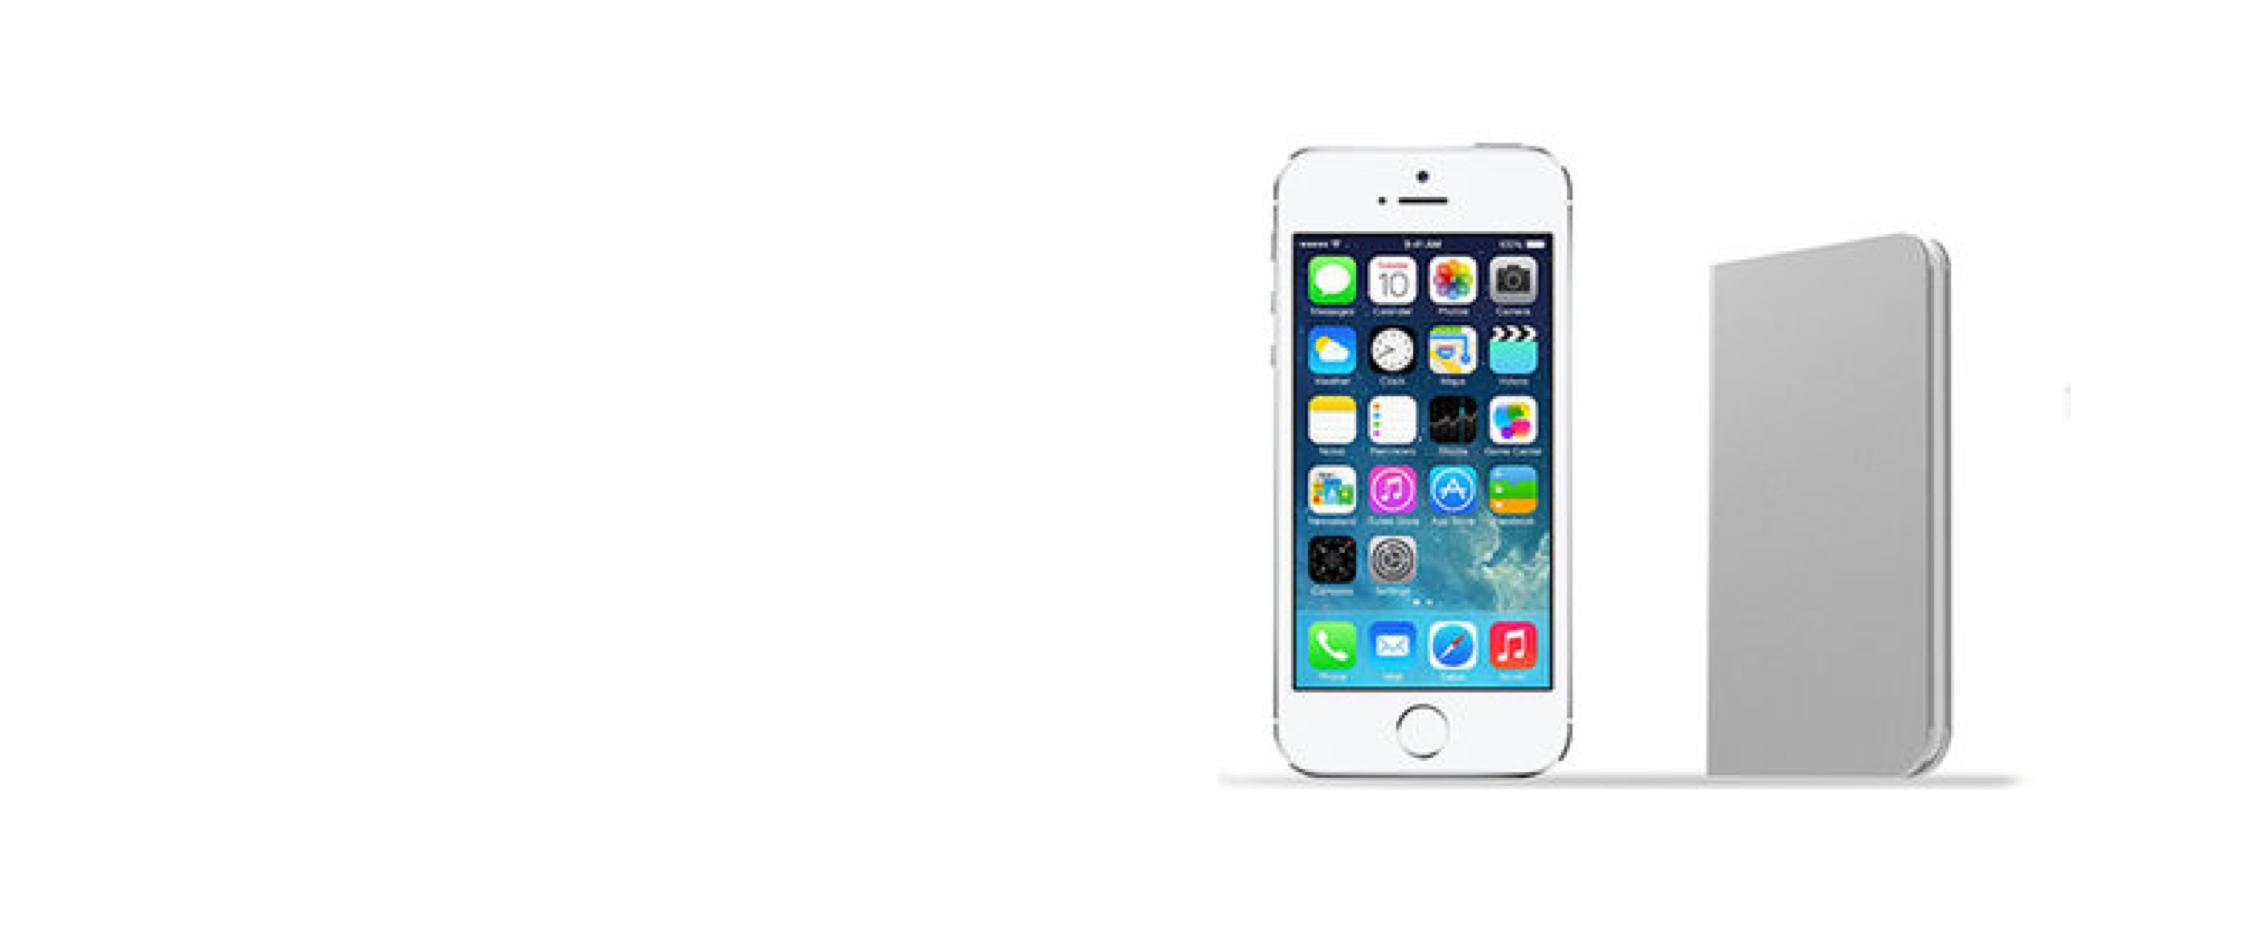 iPhone Powercharger, Powerbank, Powerstick, Juice Bank.